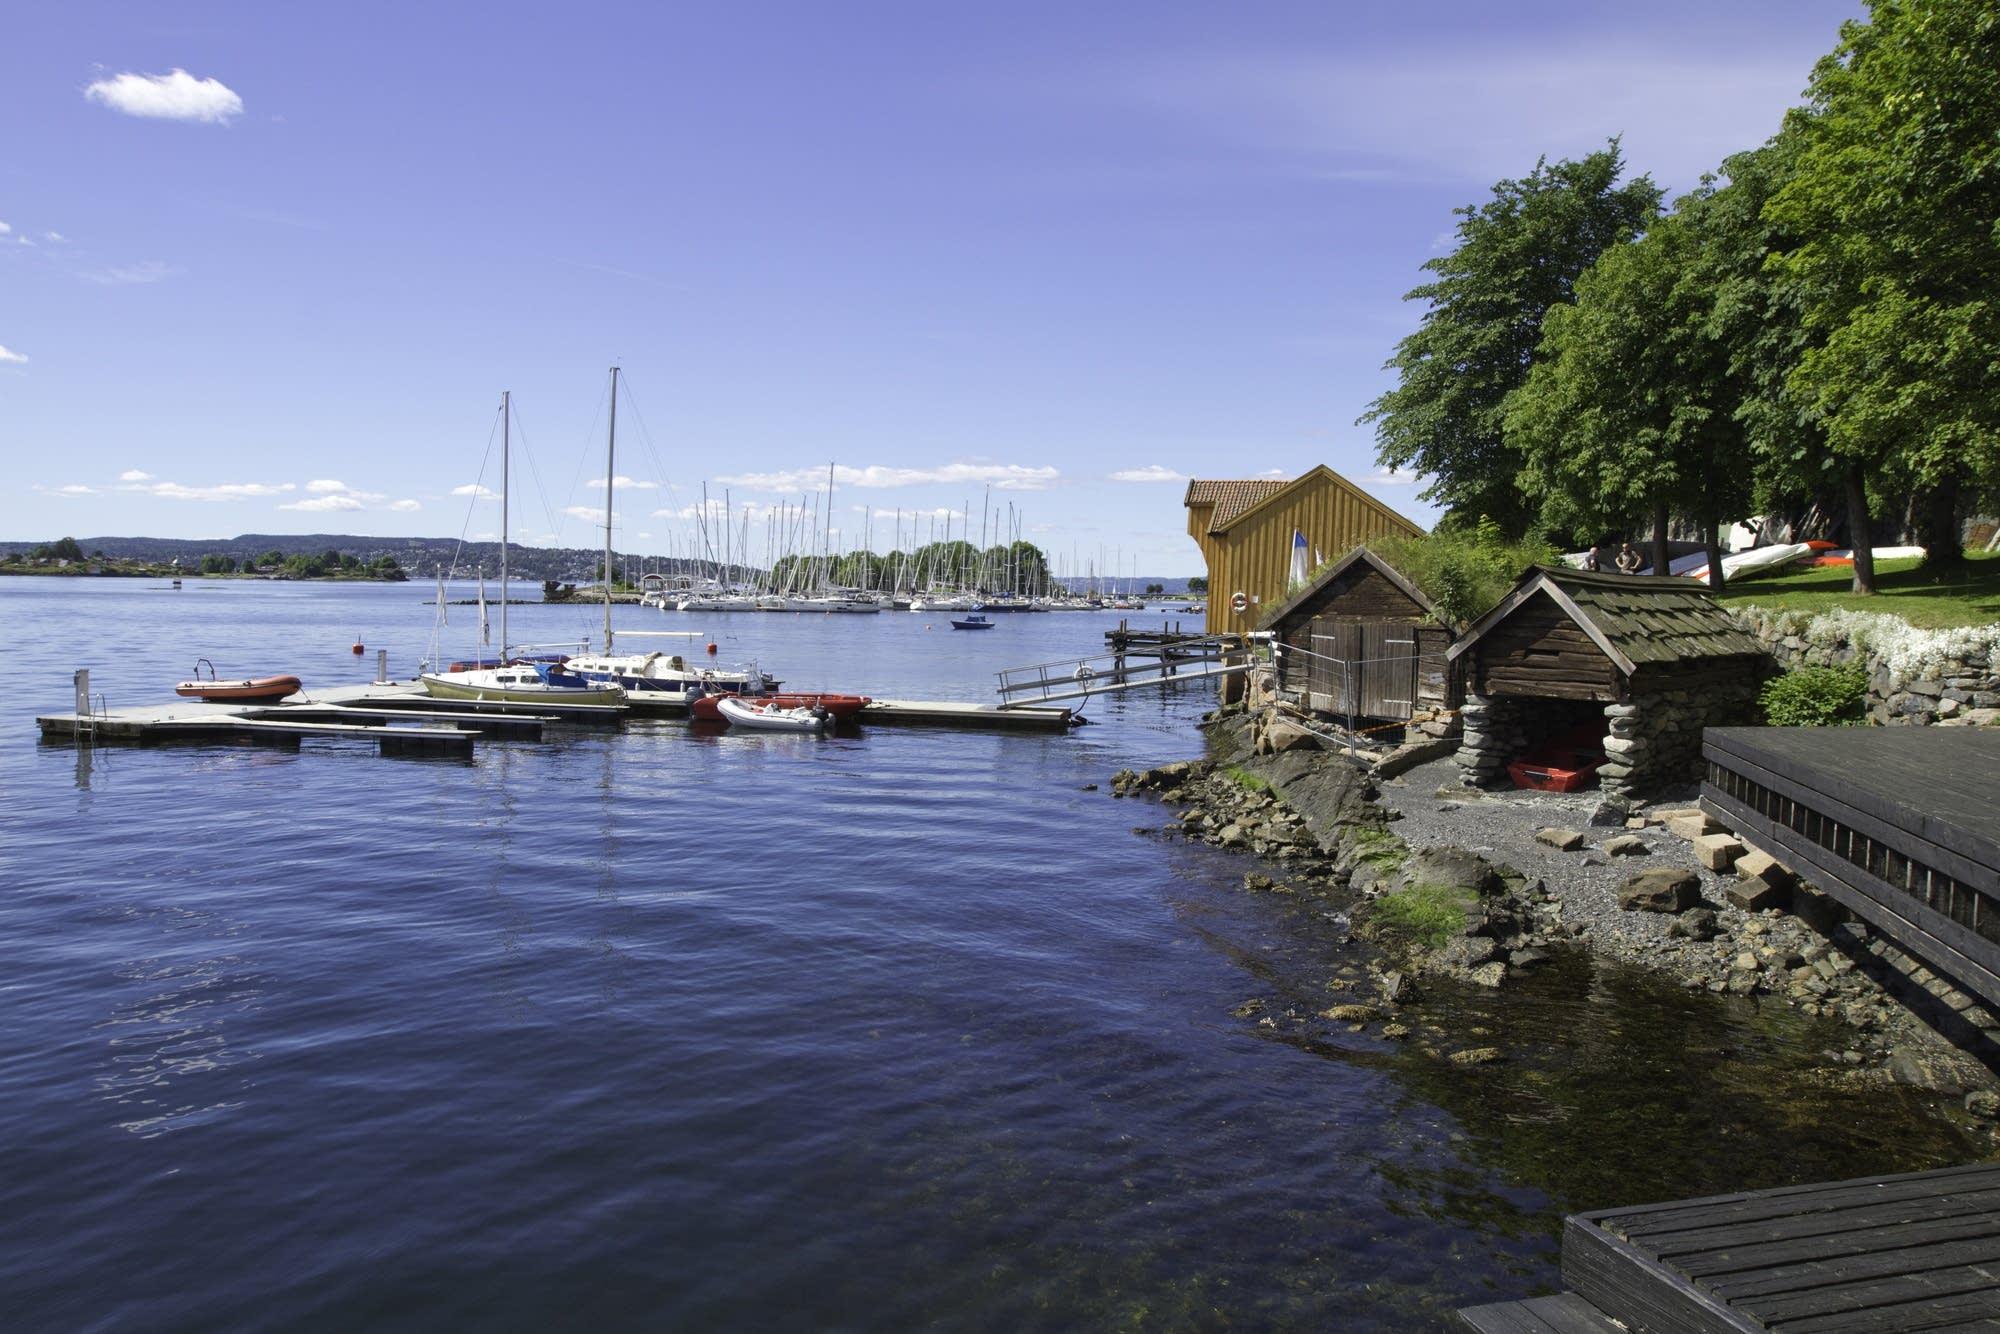 Oslo - 29 - boats and sheds